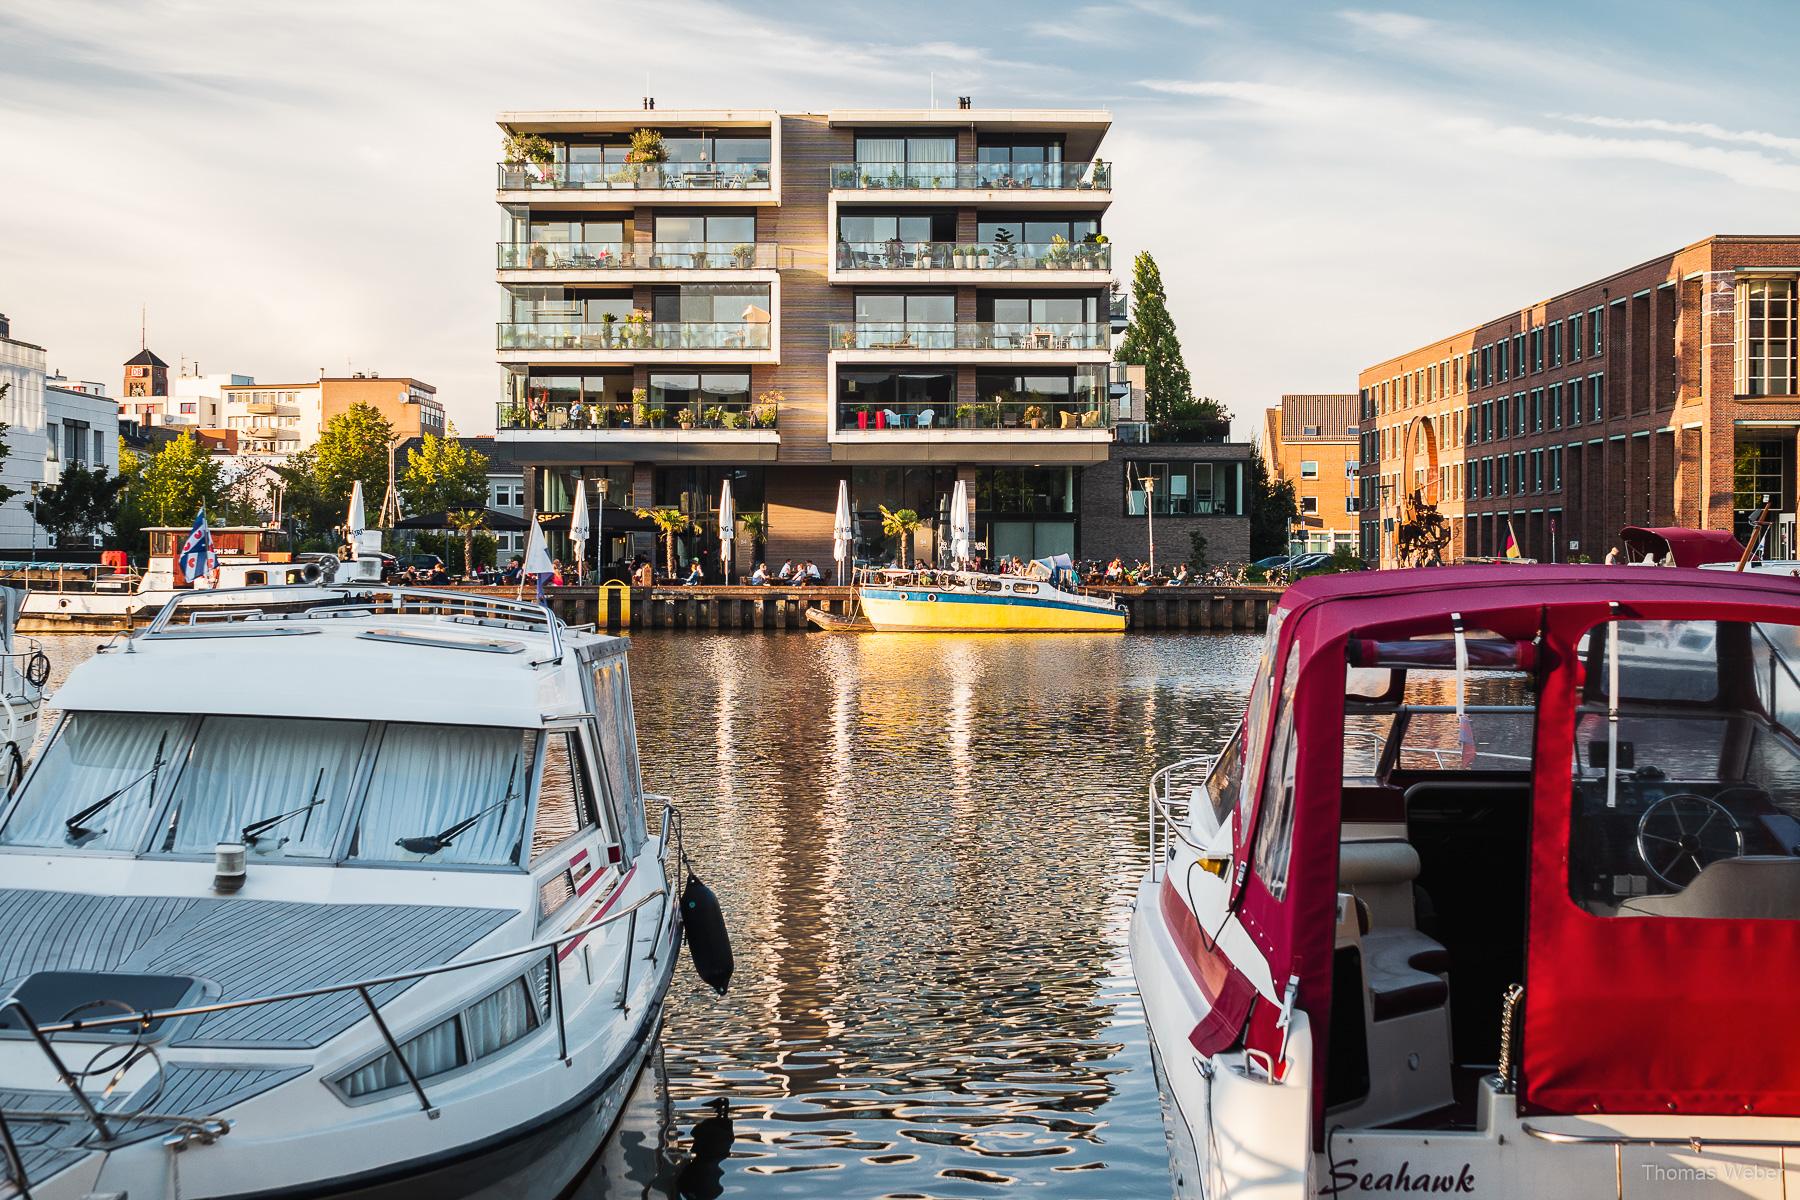 Yachthafen von Oldenburg, Hafen von Oldenburg, Hafenpromenade Oldenburg, Fotograf Thomas Weber